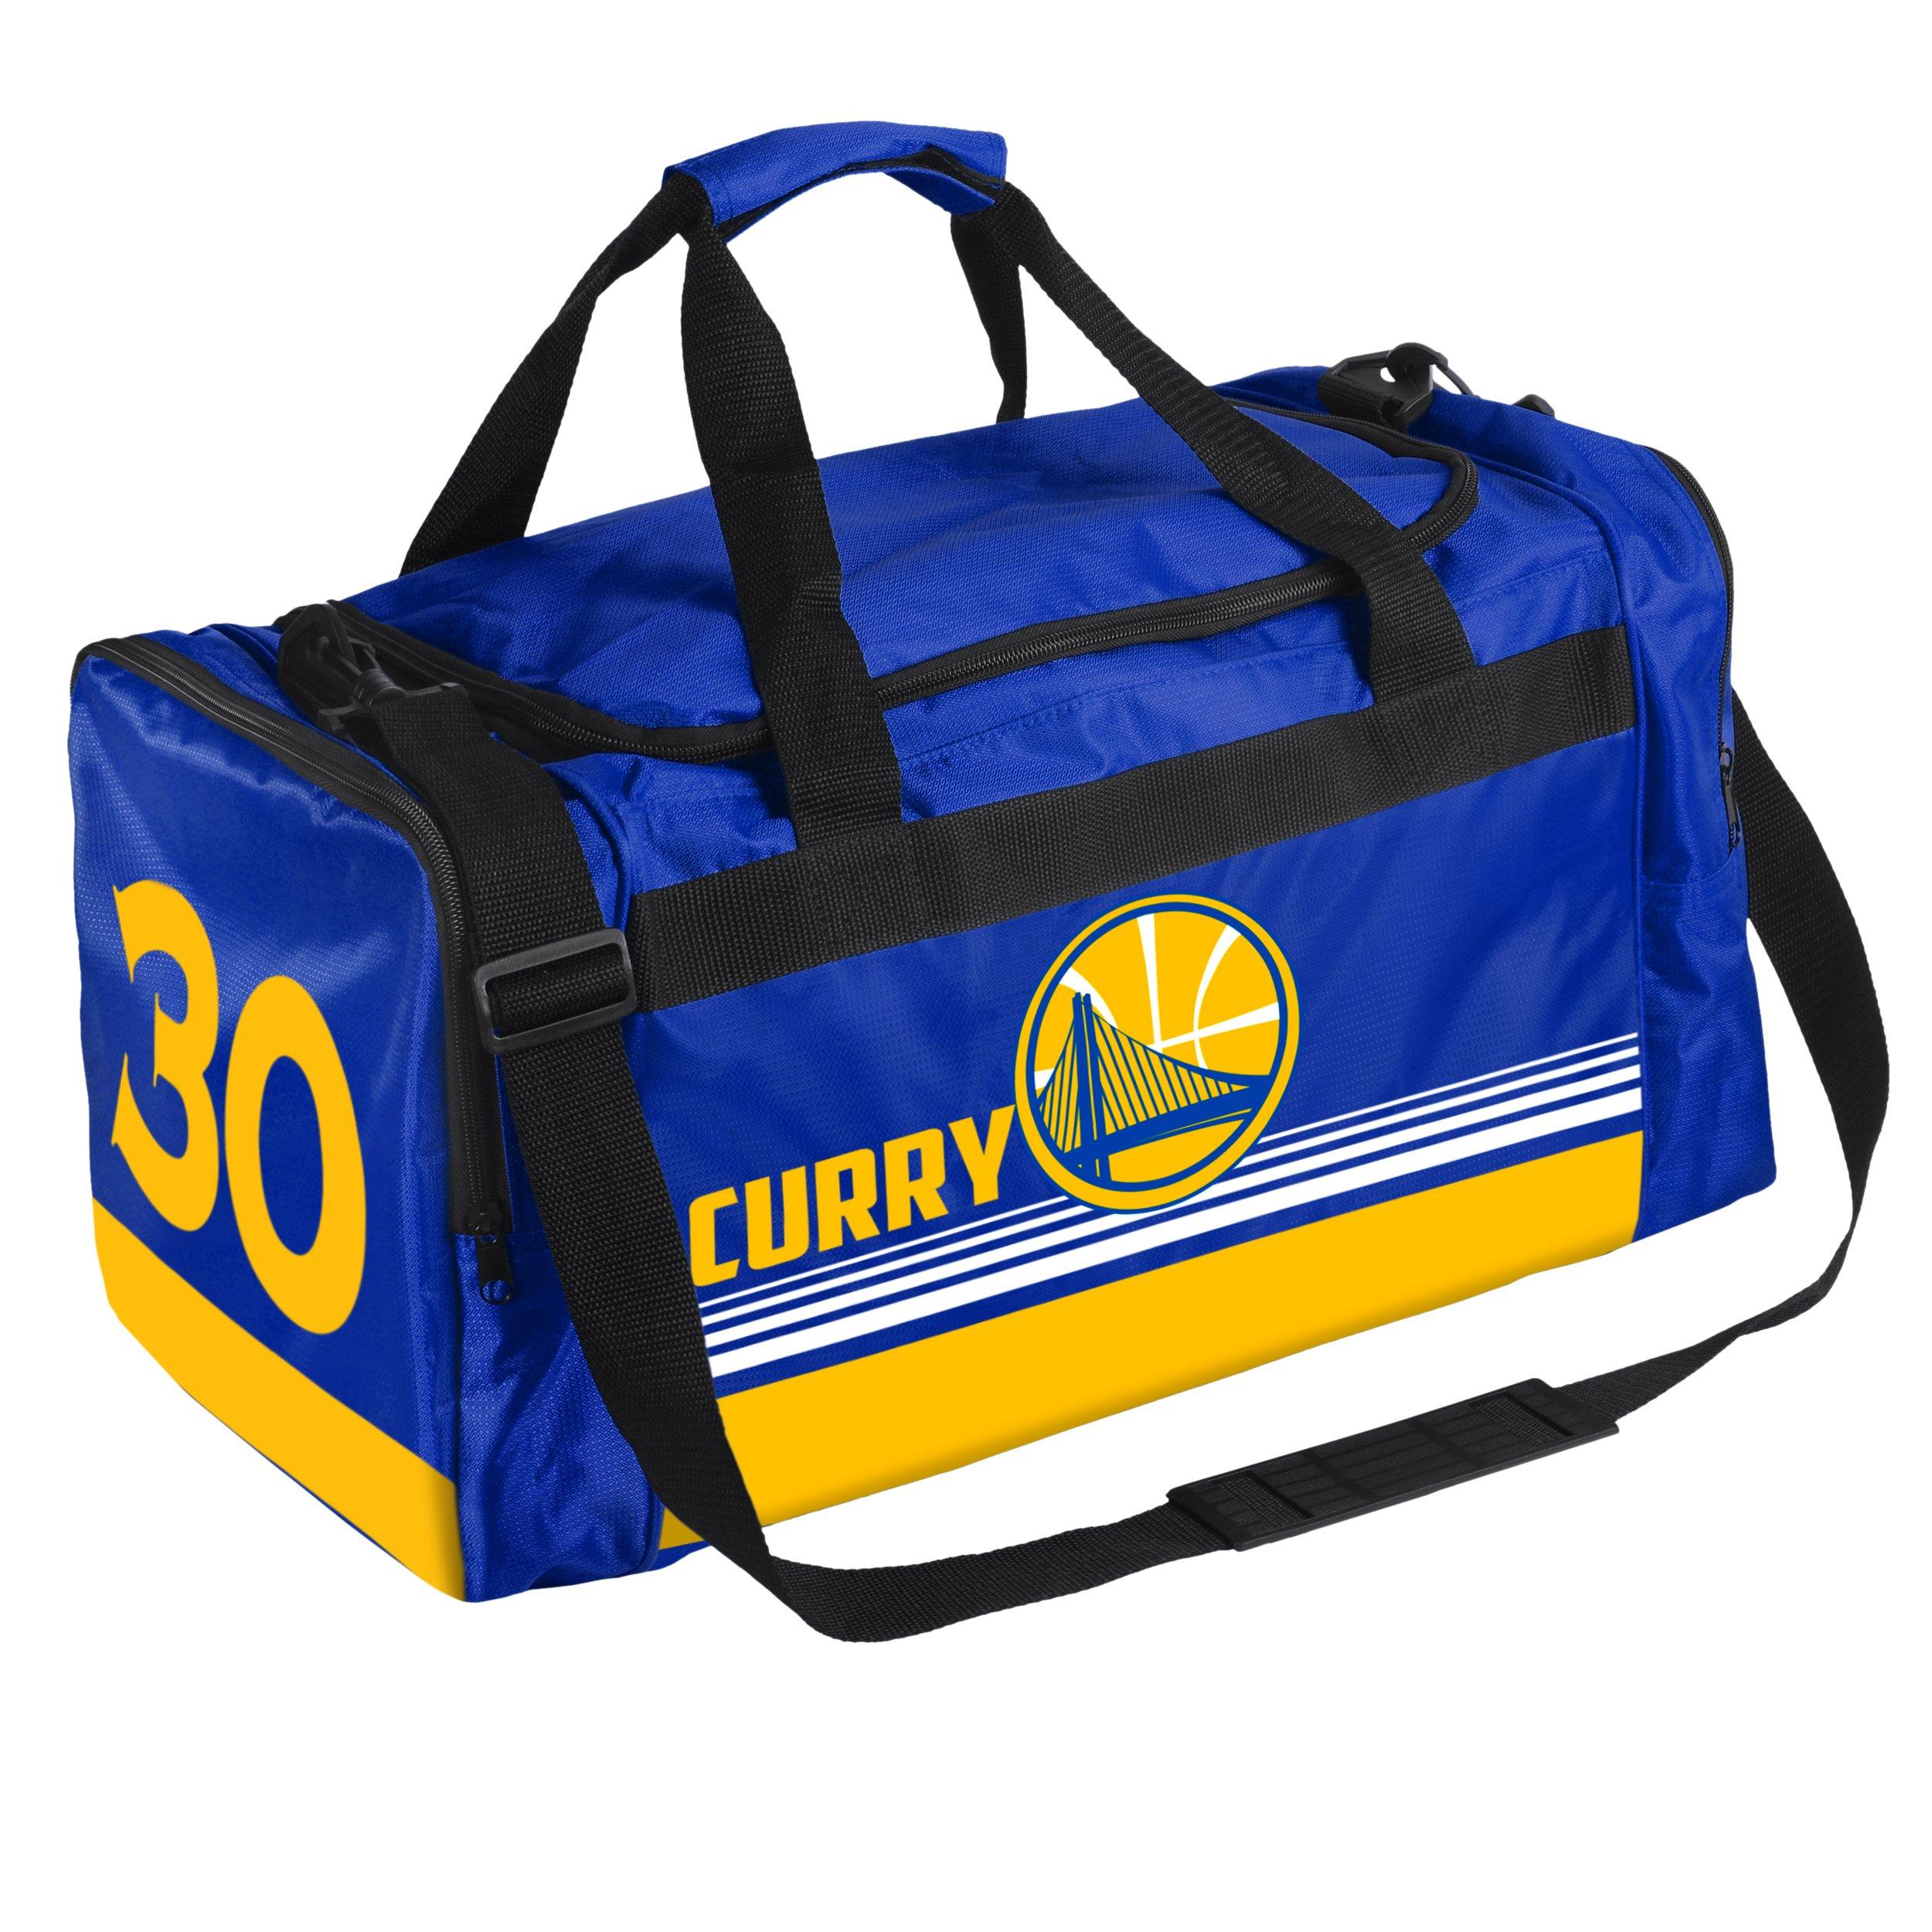 FOCO Golden State Warriors Curry S. #30 Medium Striped Core Duffle Bag